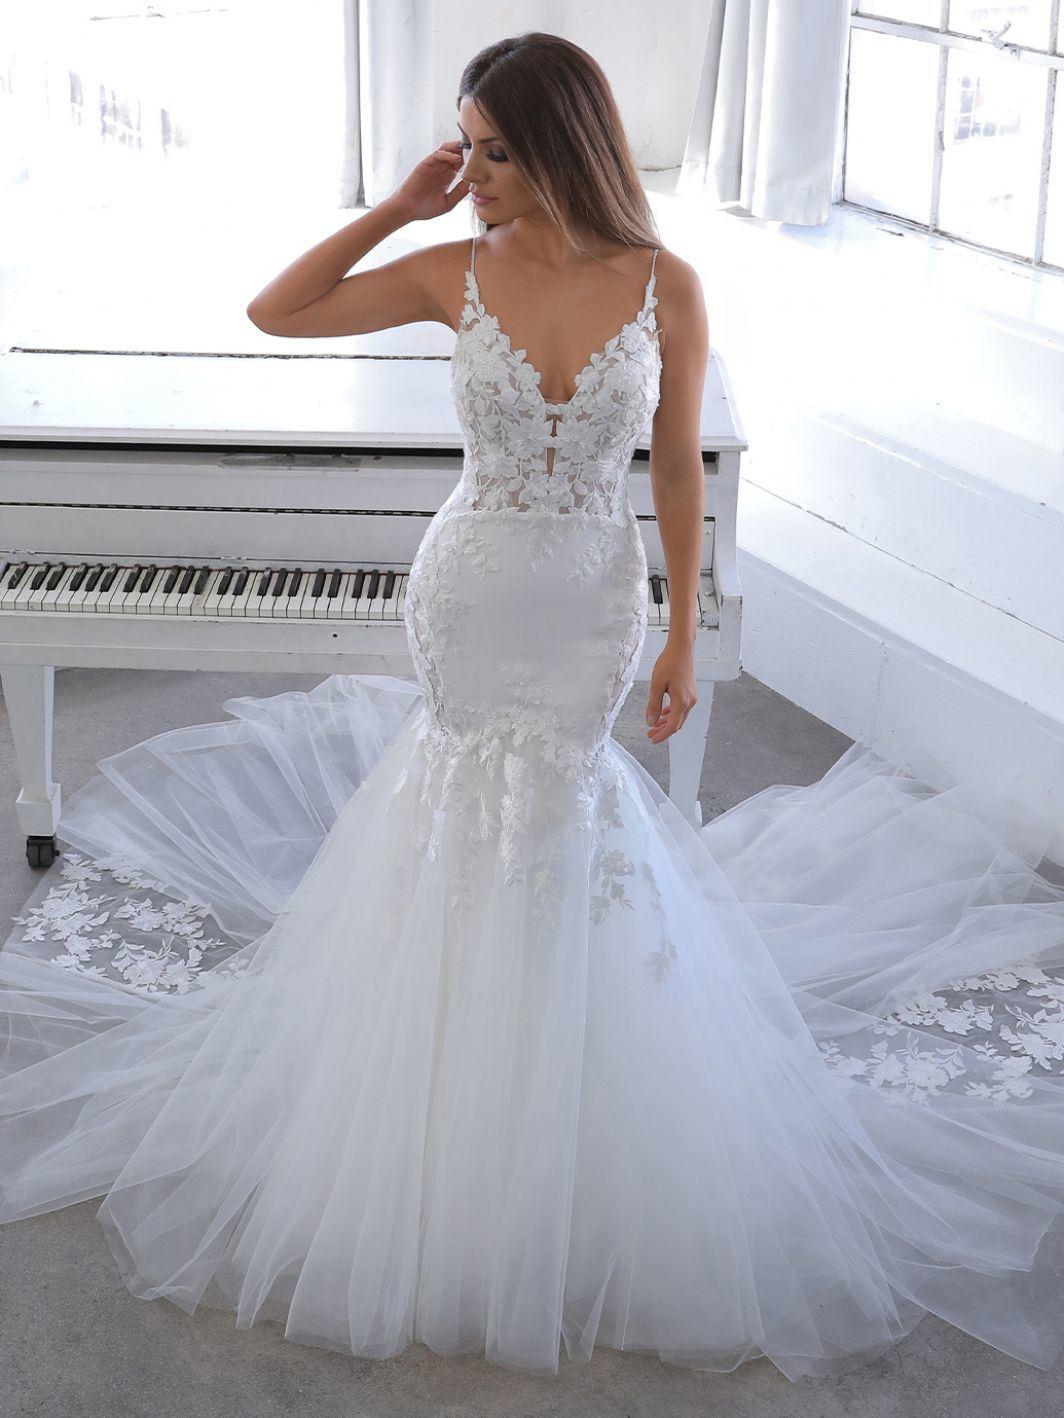 Spaghetti Straps Wedding Gown Lace Mermaid Bridal Dresses M20 ...